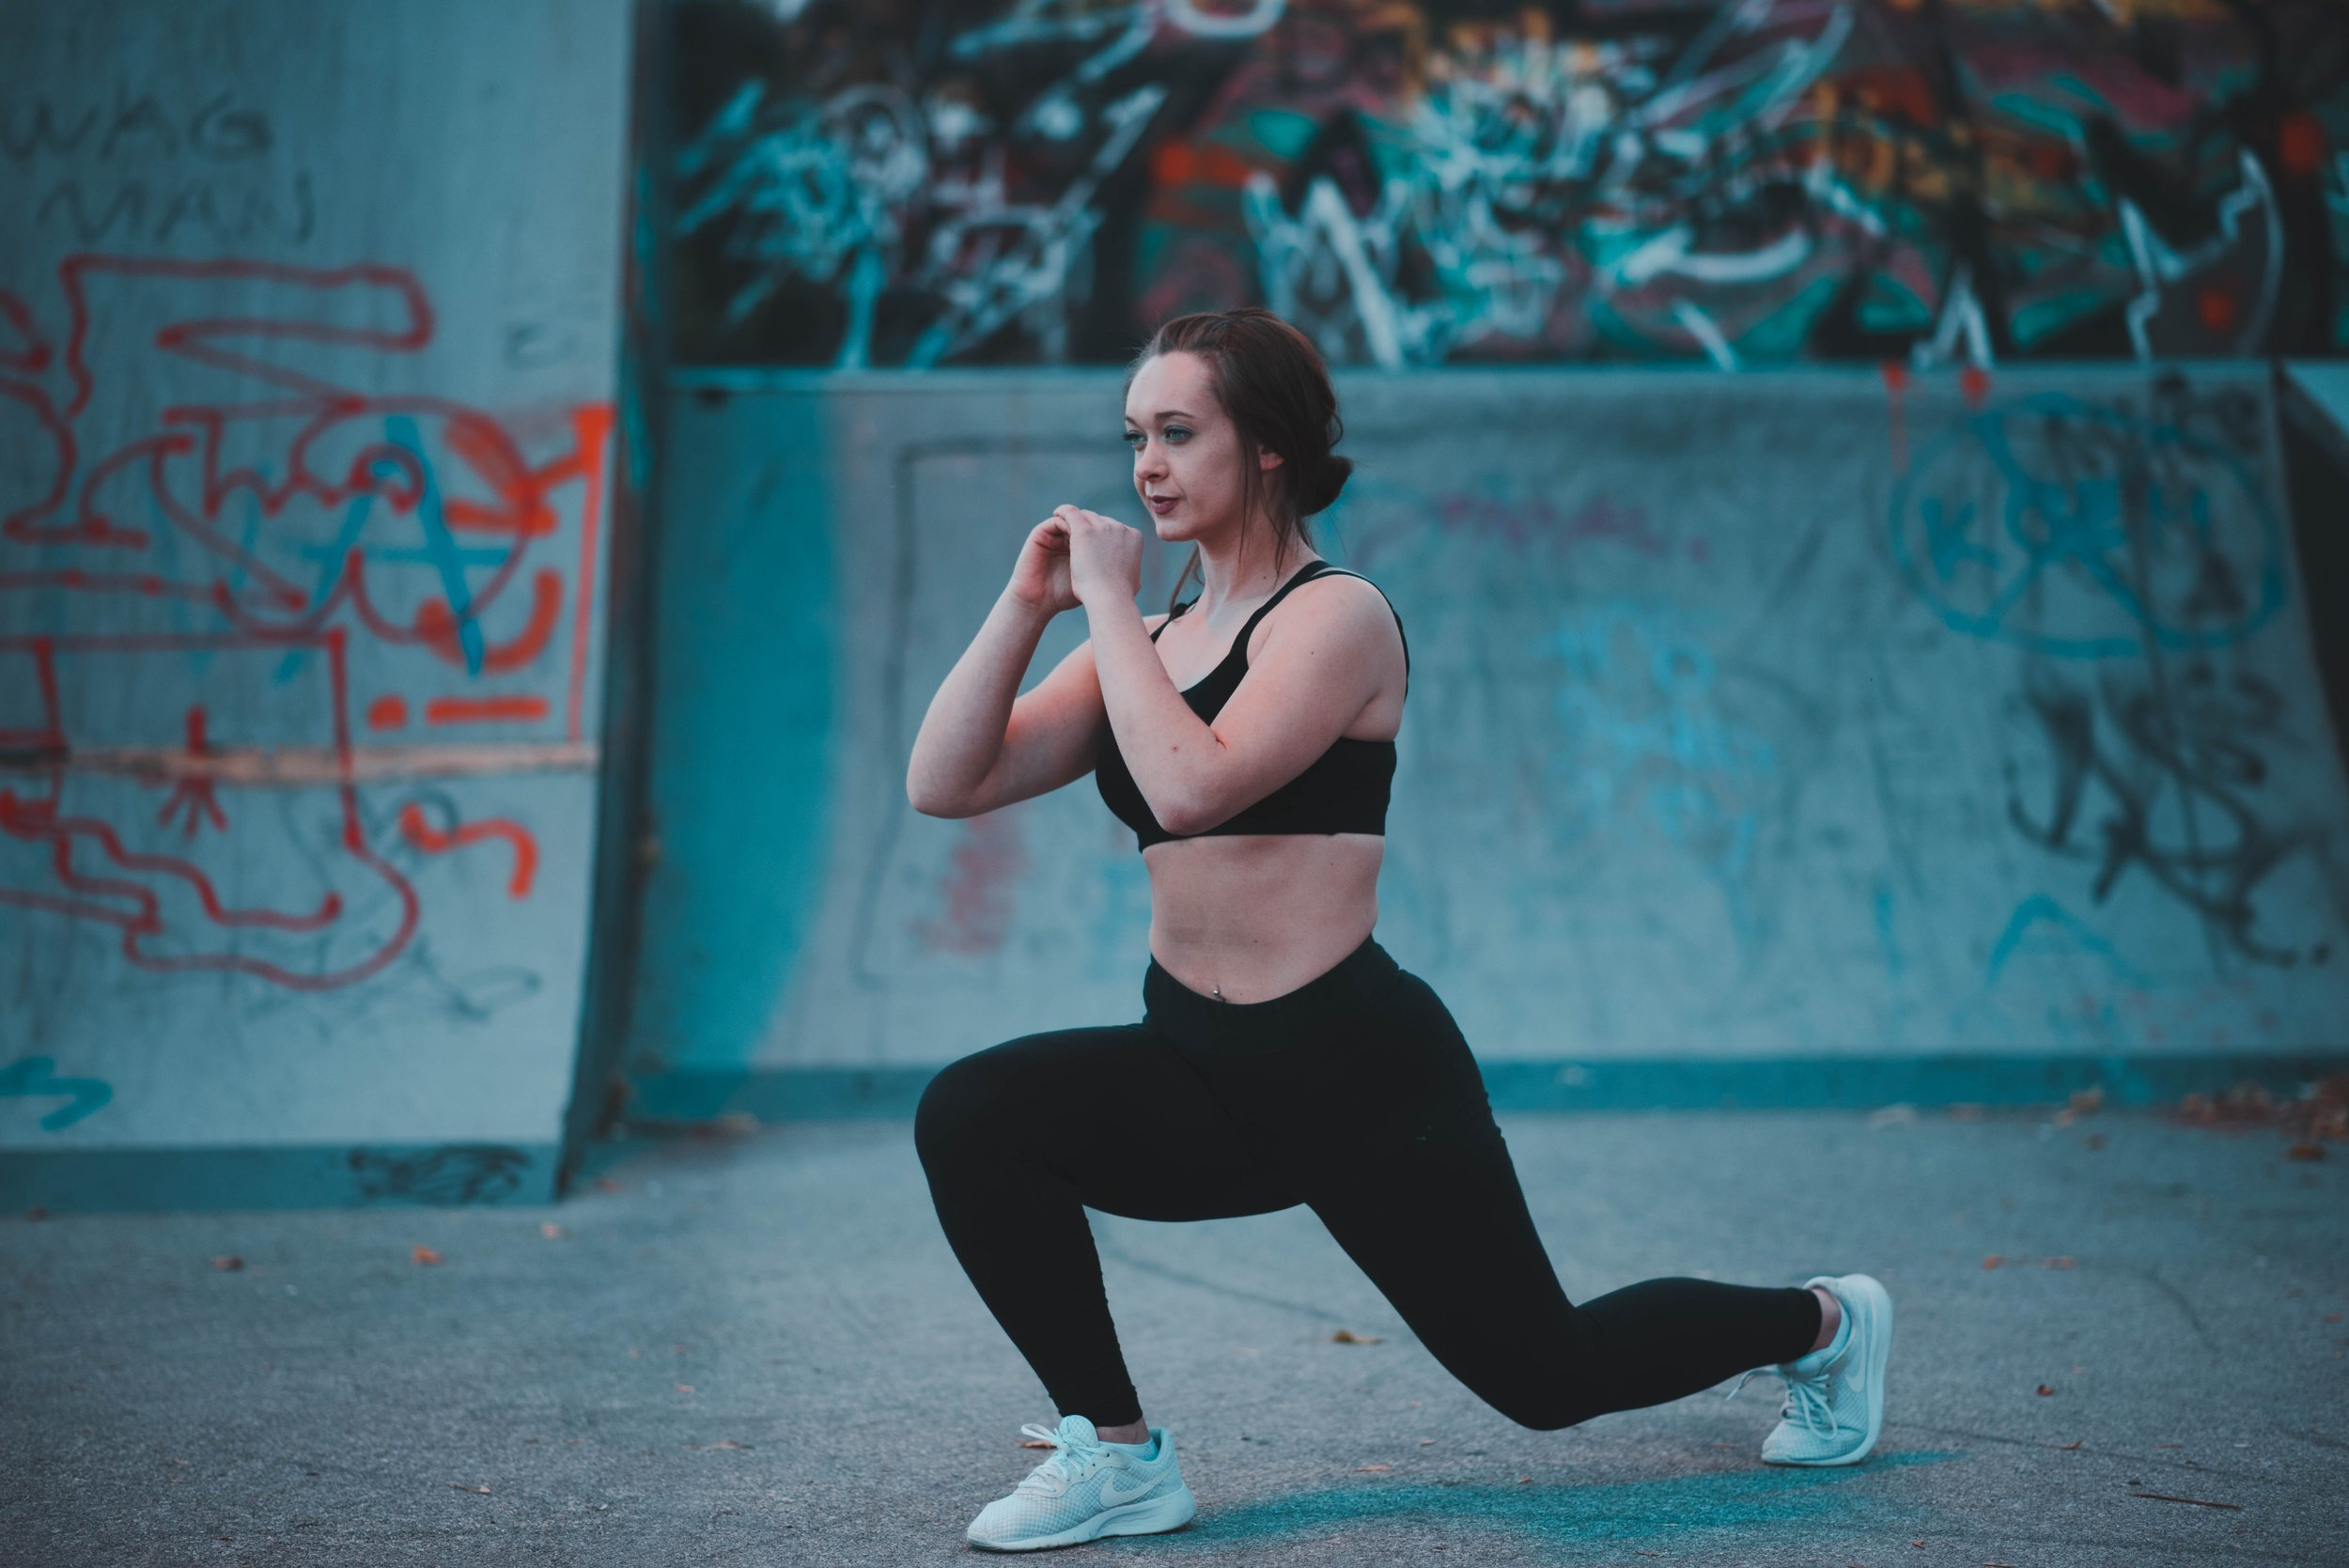 active-athletic-attractive-1582161.jpg